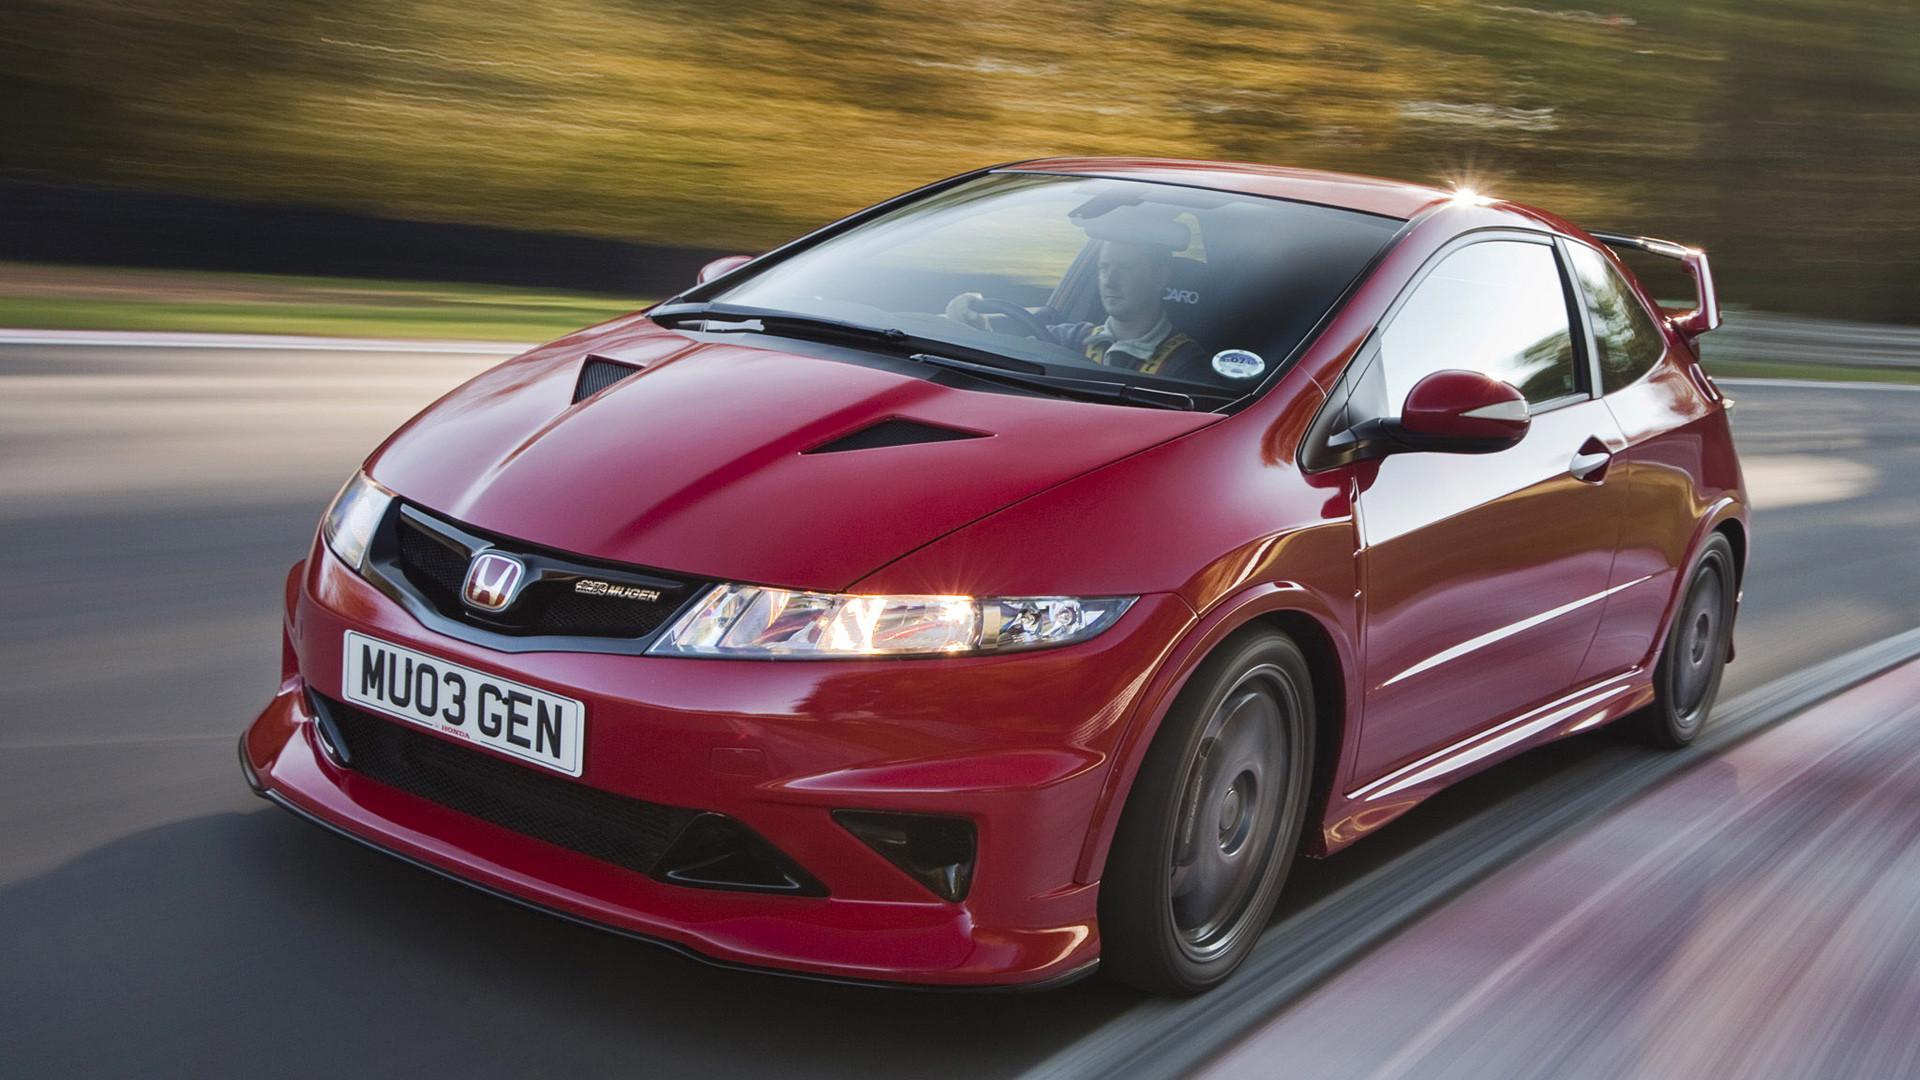 Res: 1920x1080, wallpapers/Honda/2009-Honda-Civic-Type-R-Prototype-by-Mugen-V6-1080.jpg